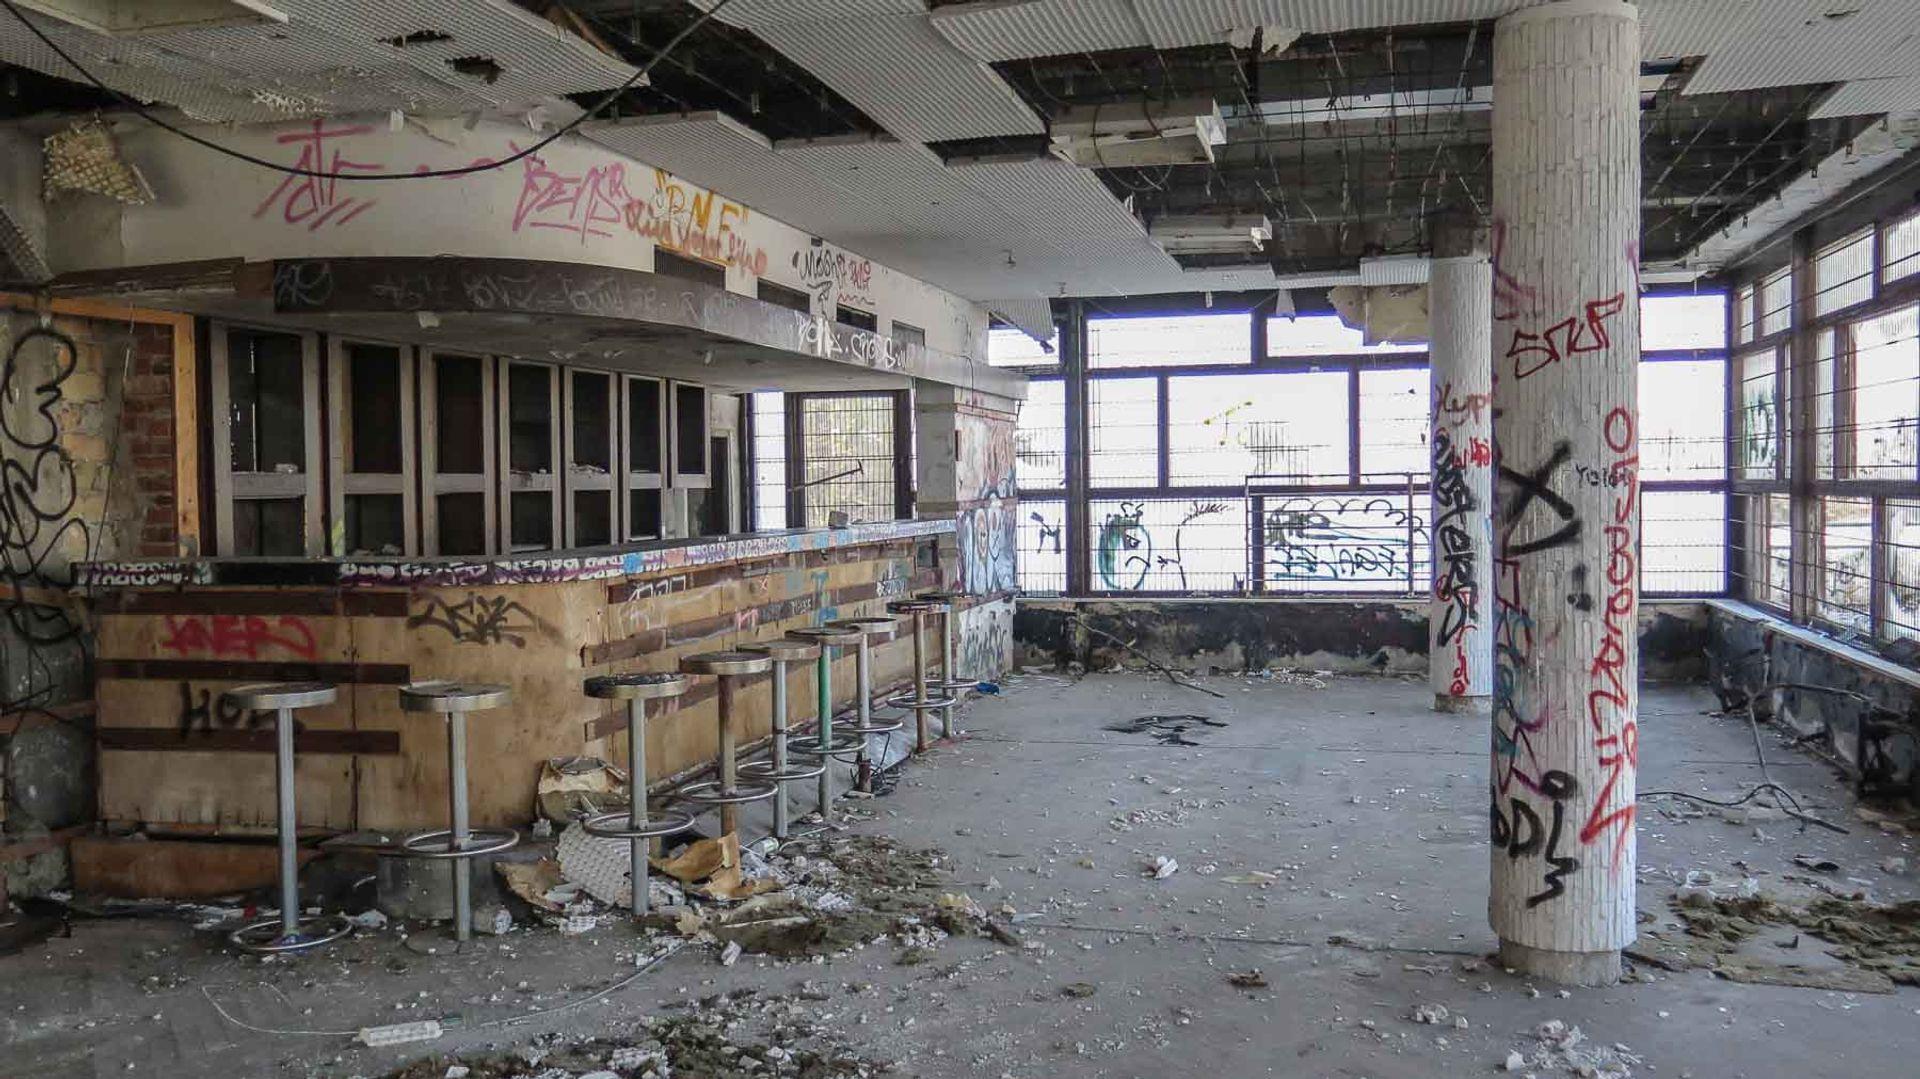 The inside of the communist-era restaurant Minsk, located in Potsdam Photo courtesy of berlinstaiga.de